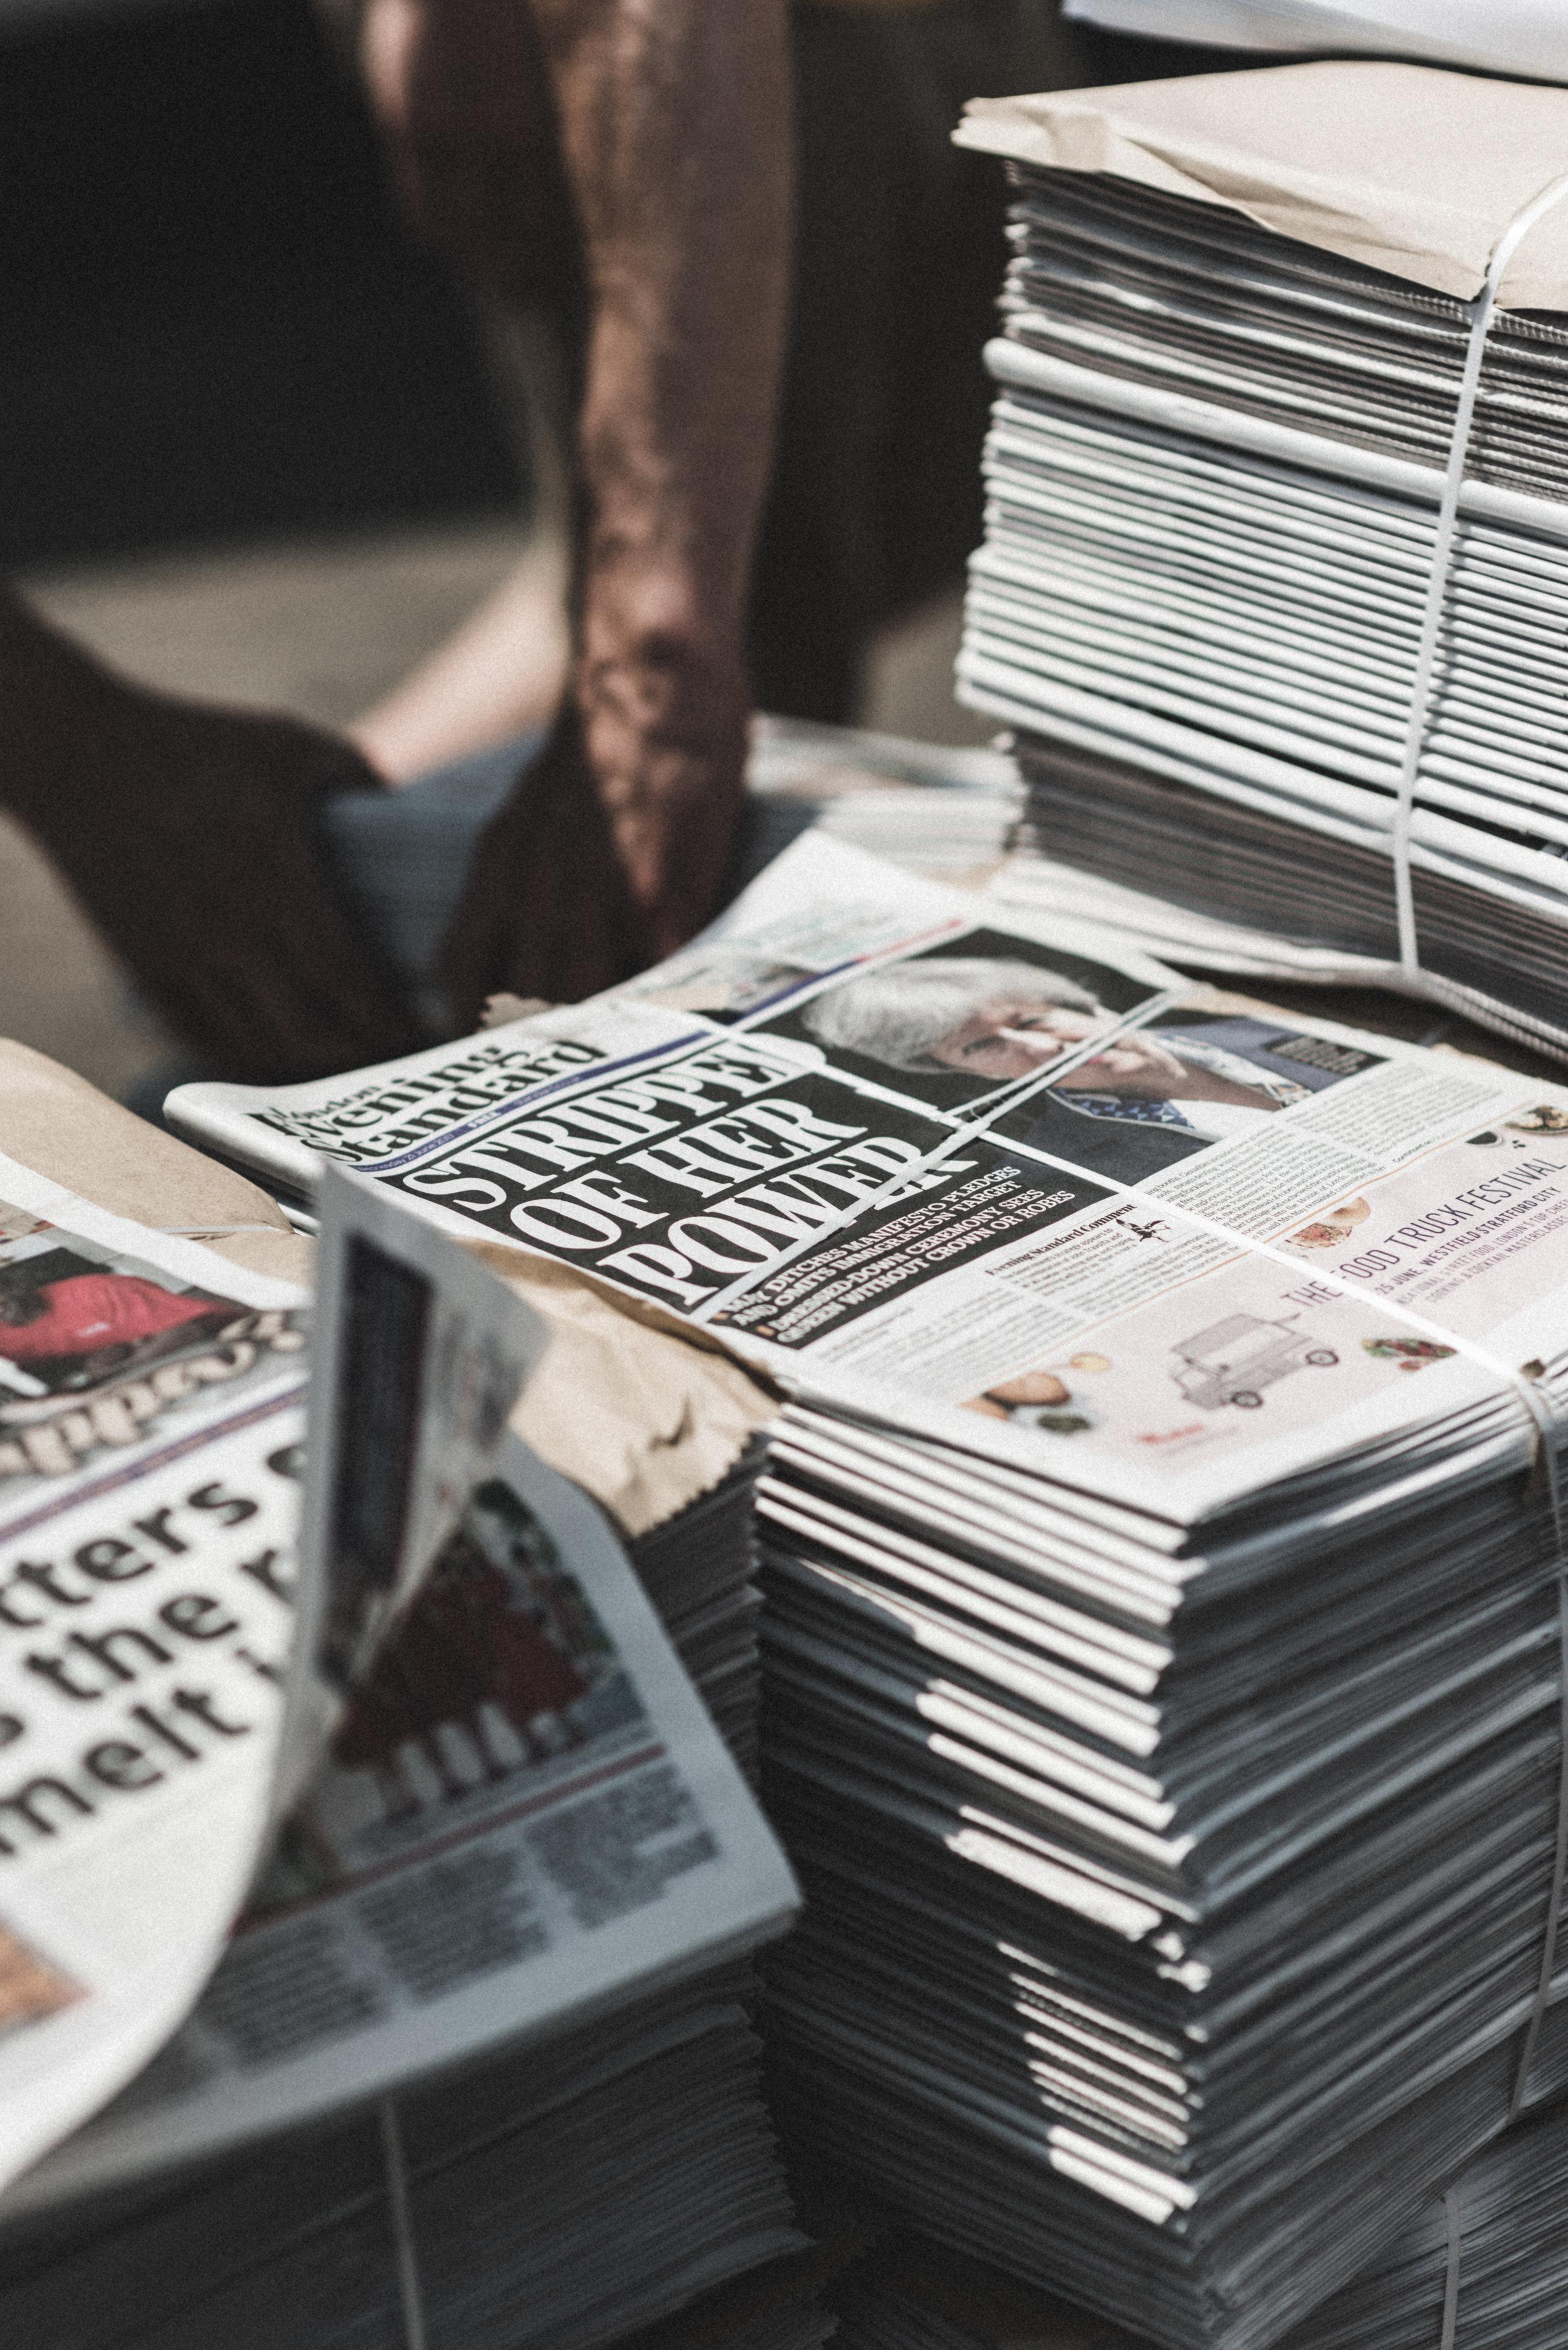 Newspapers aren't very nice to Theresa Bae. :(